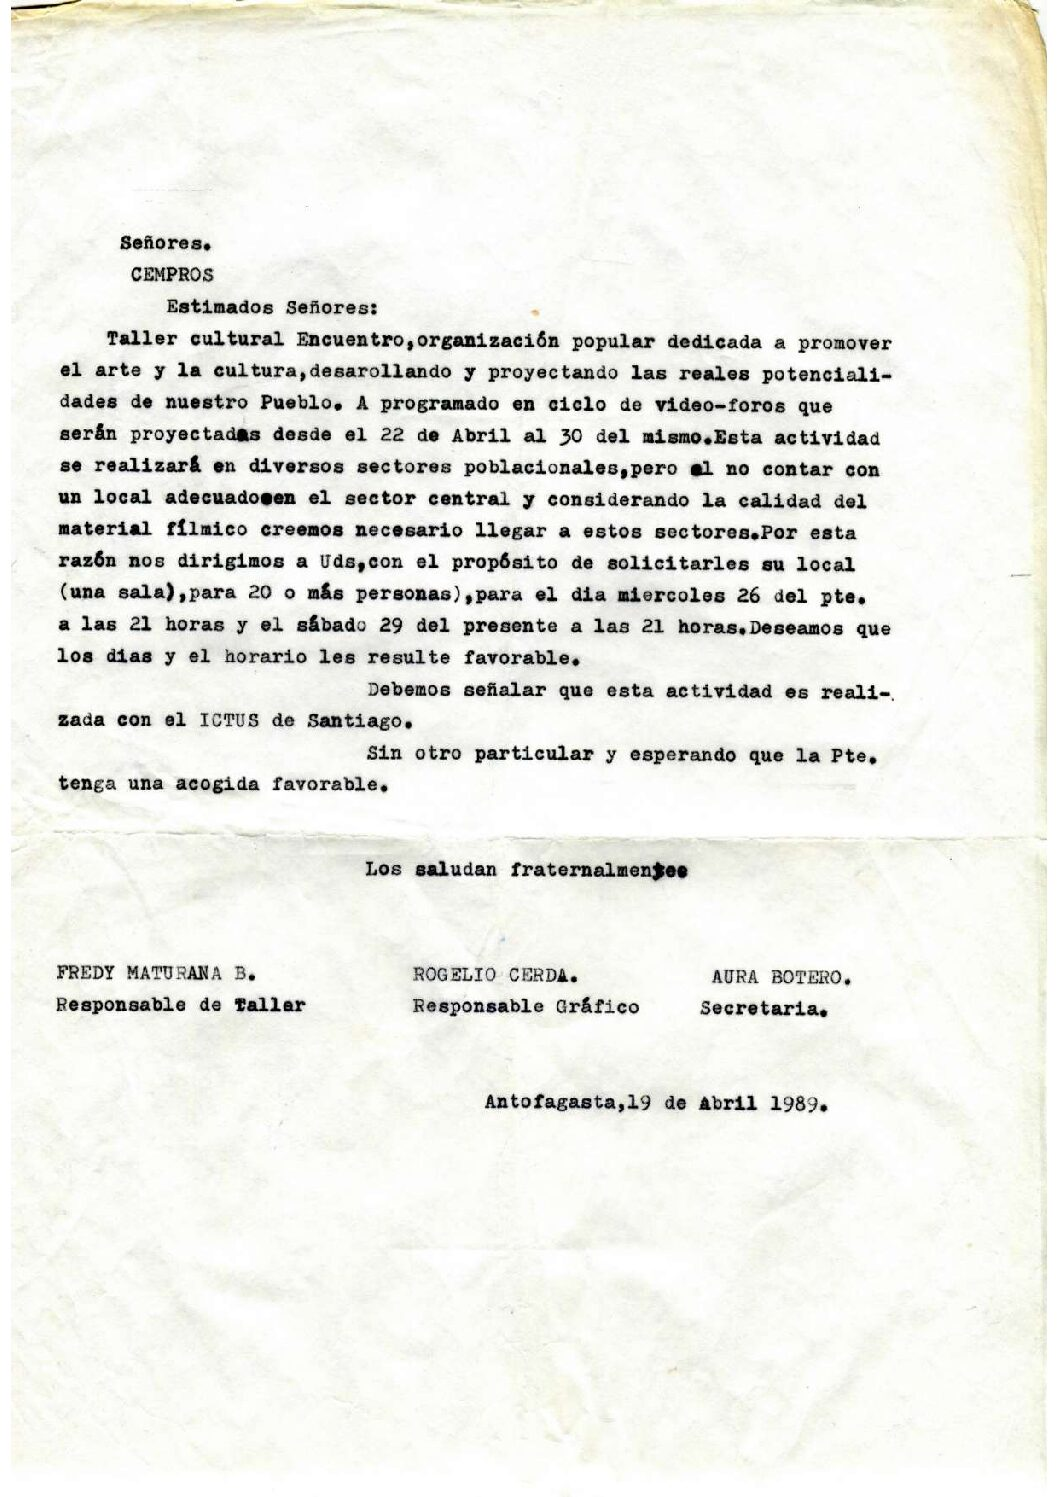 Carta a CEMPROS